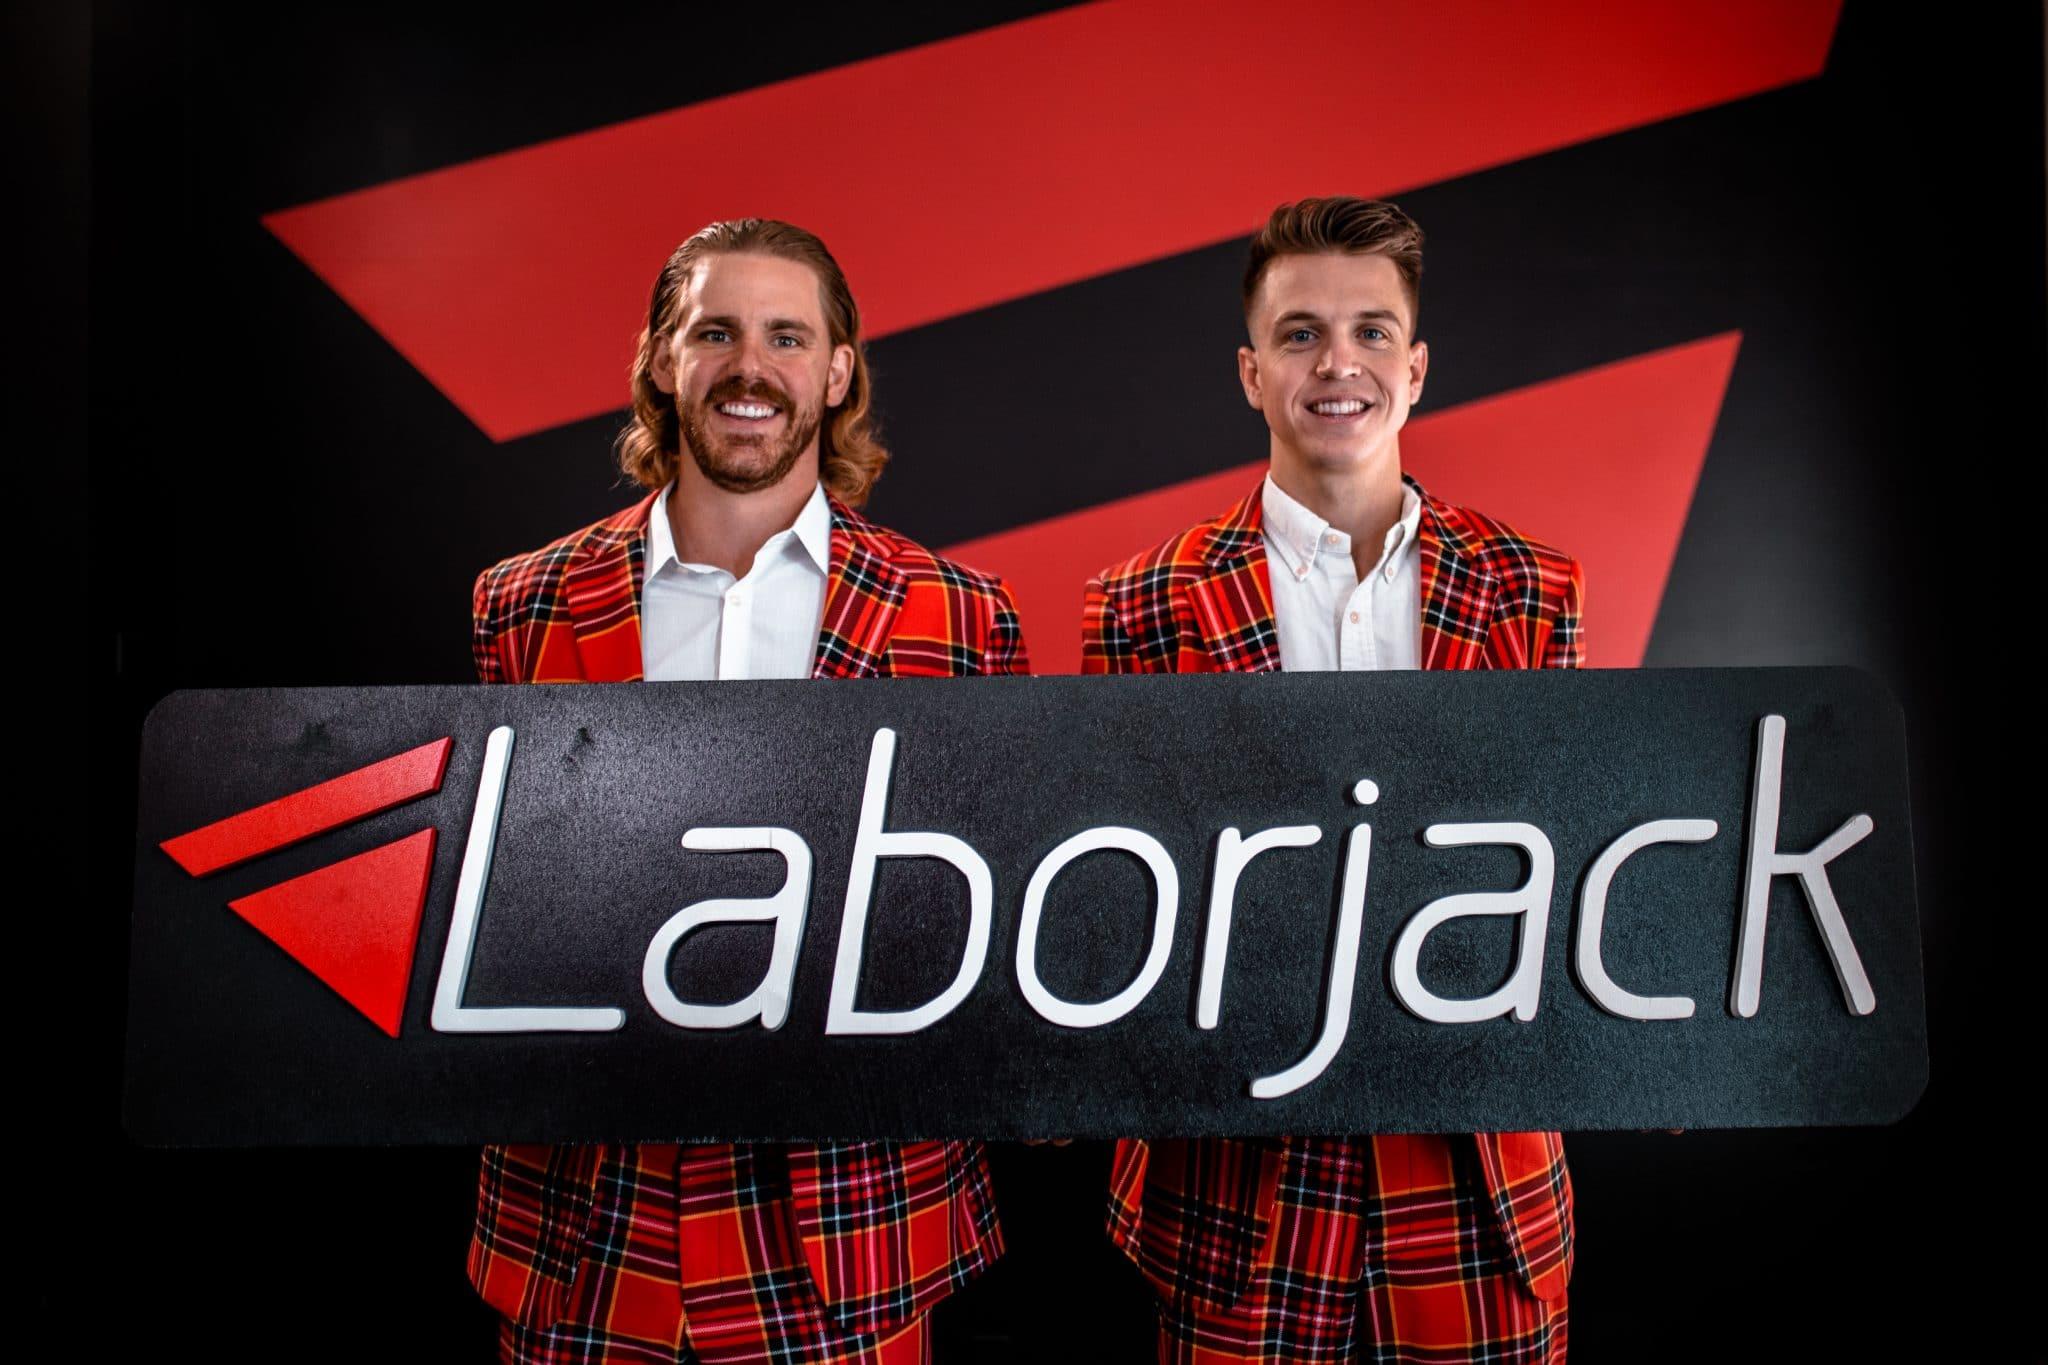 Blake Craig & Josh Moser Laborjack